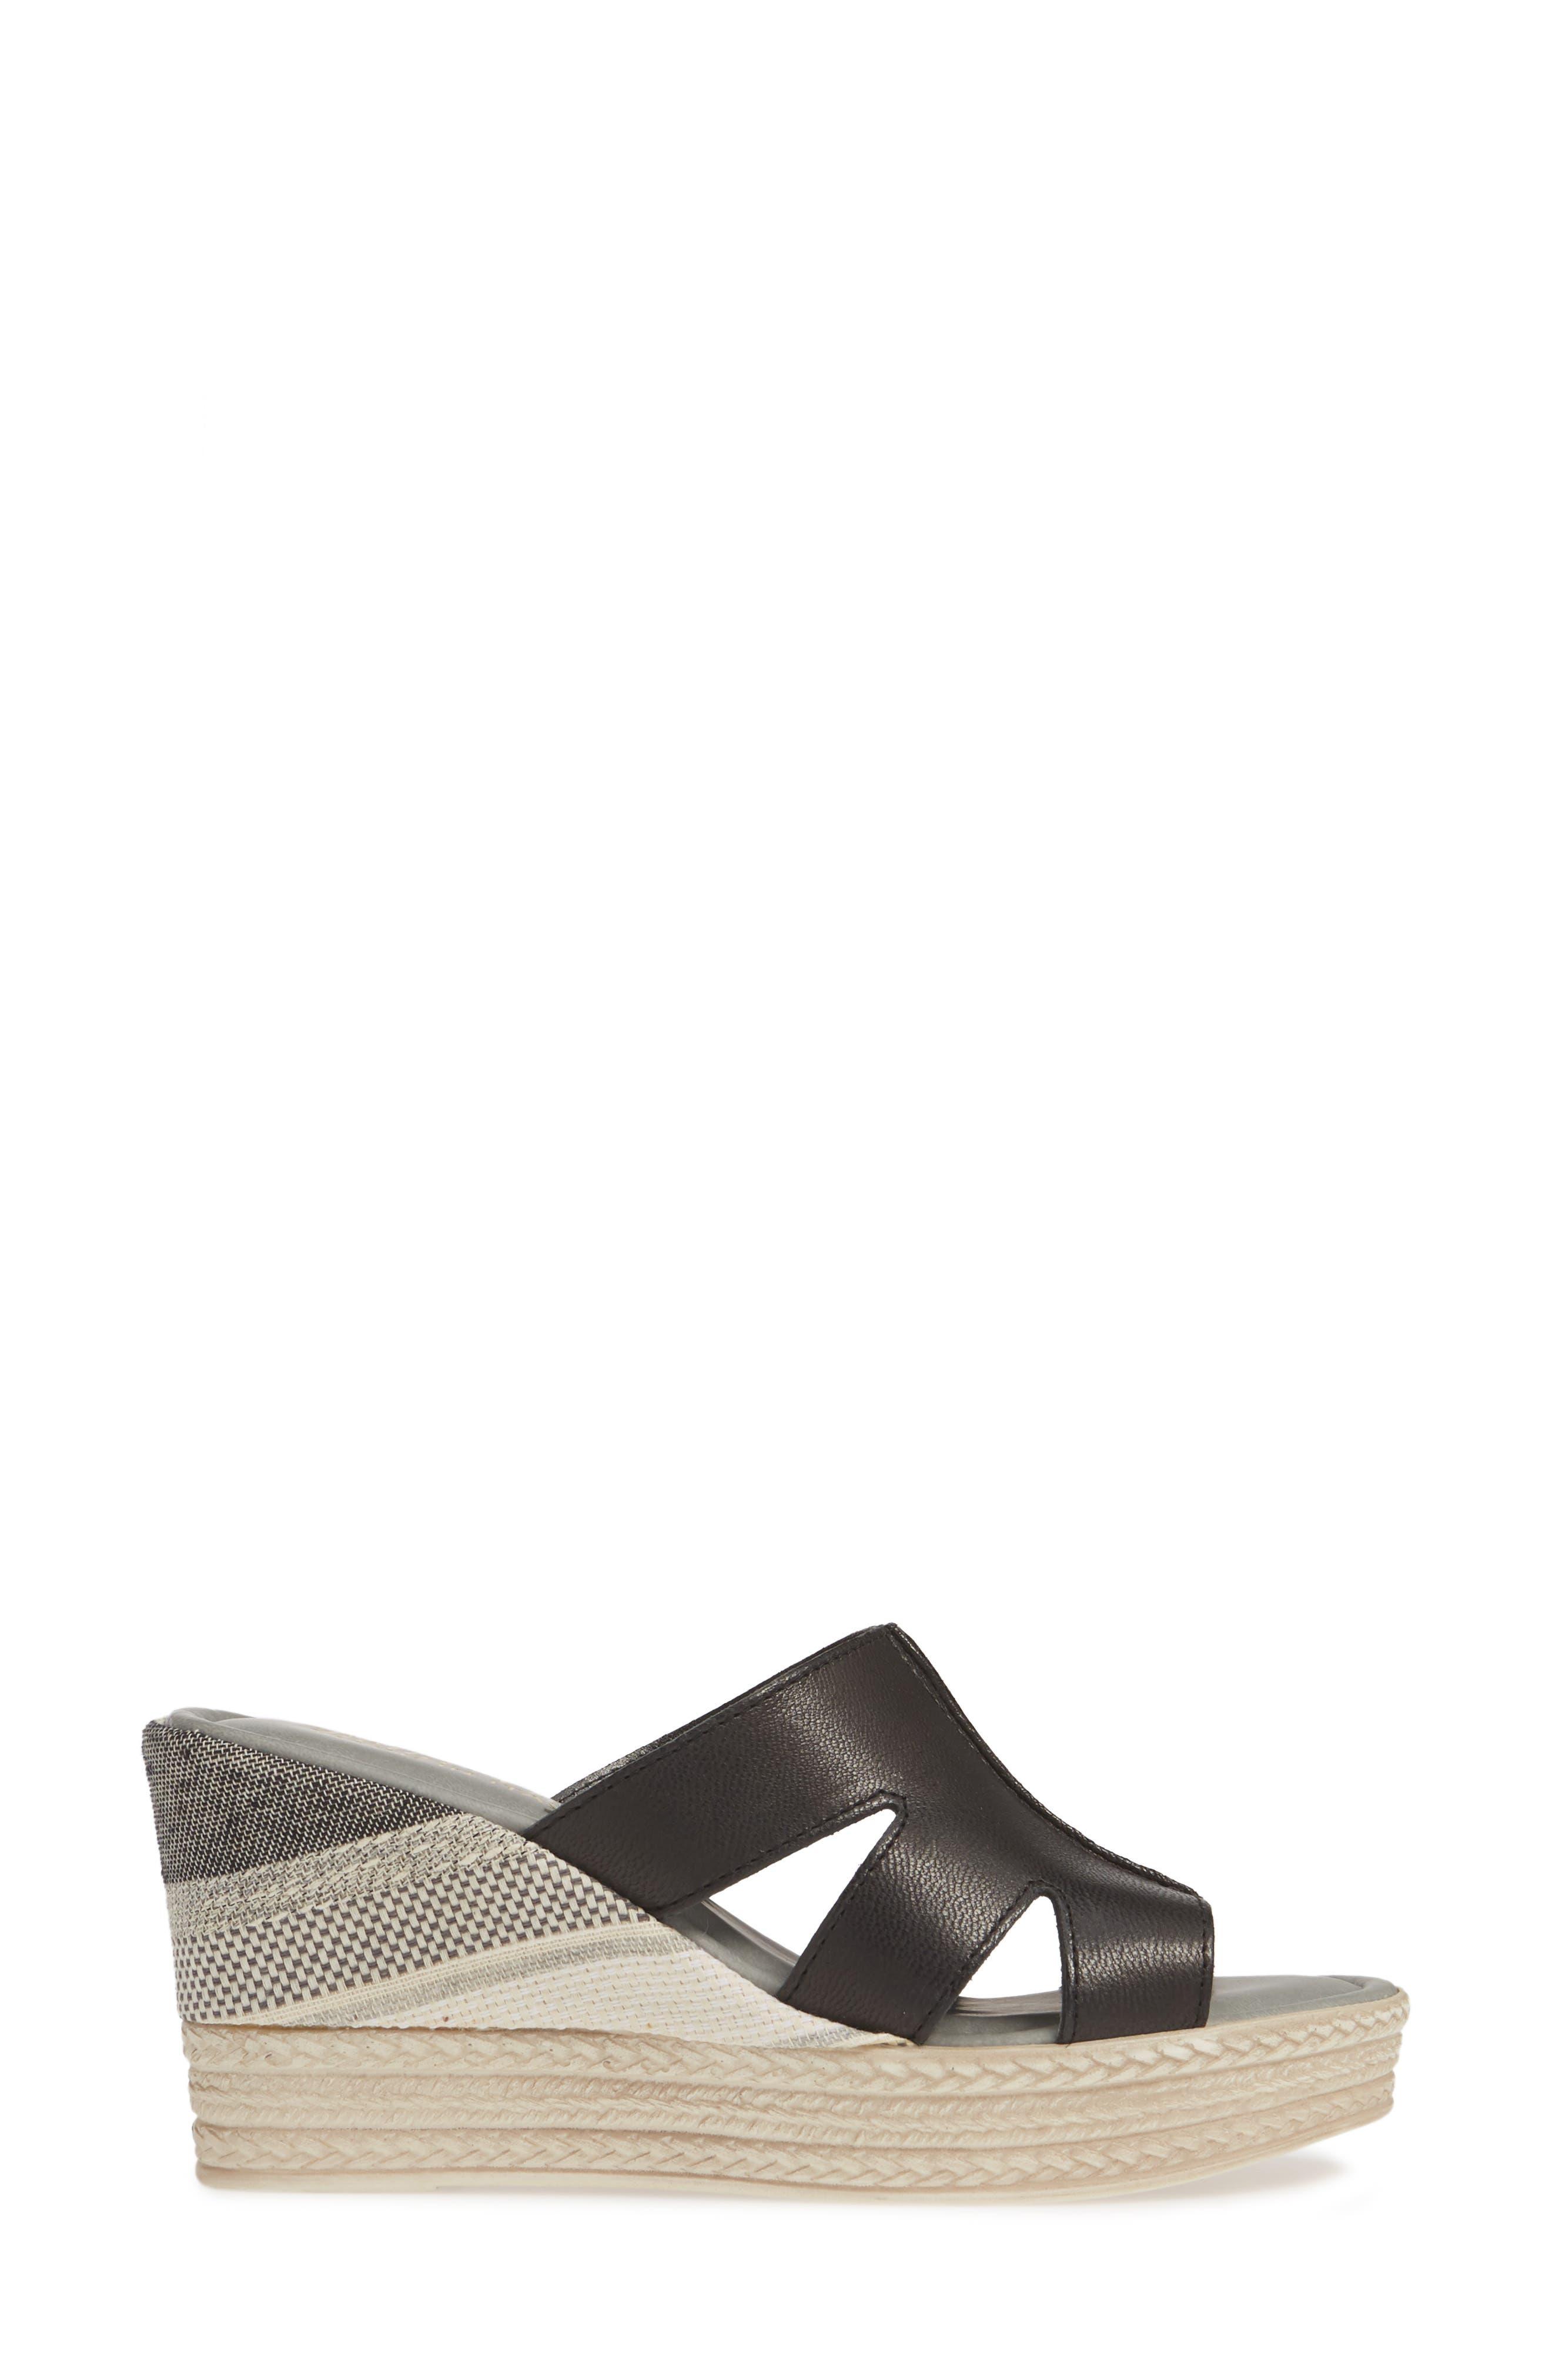 BELLA VITA, Rox Wedge Slide Sandal, Alternate thumbnail 3, color, BLACK ITALIAN LEATHER